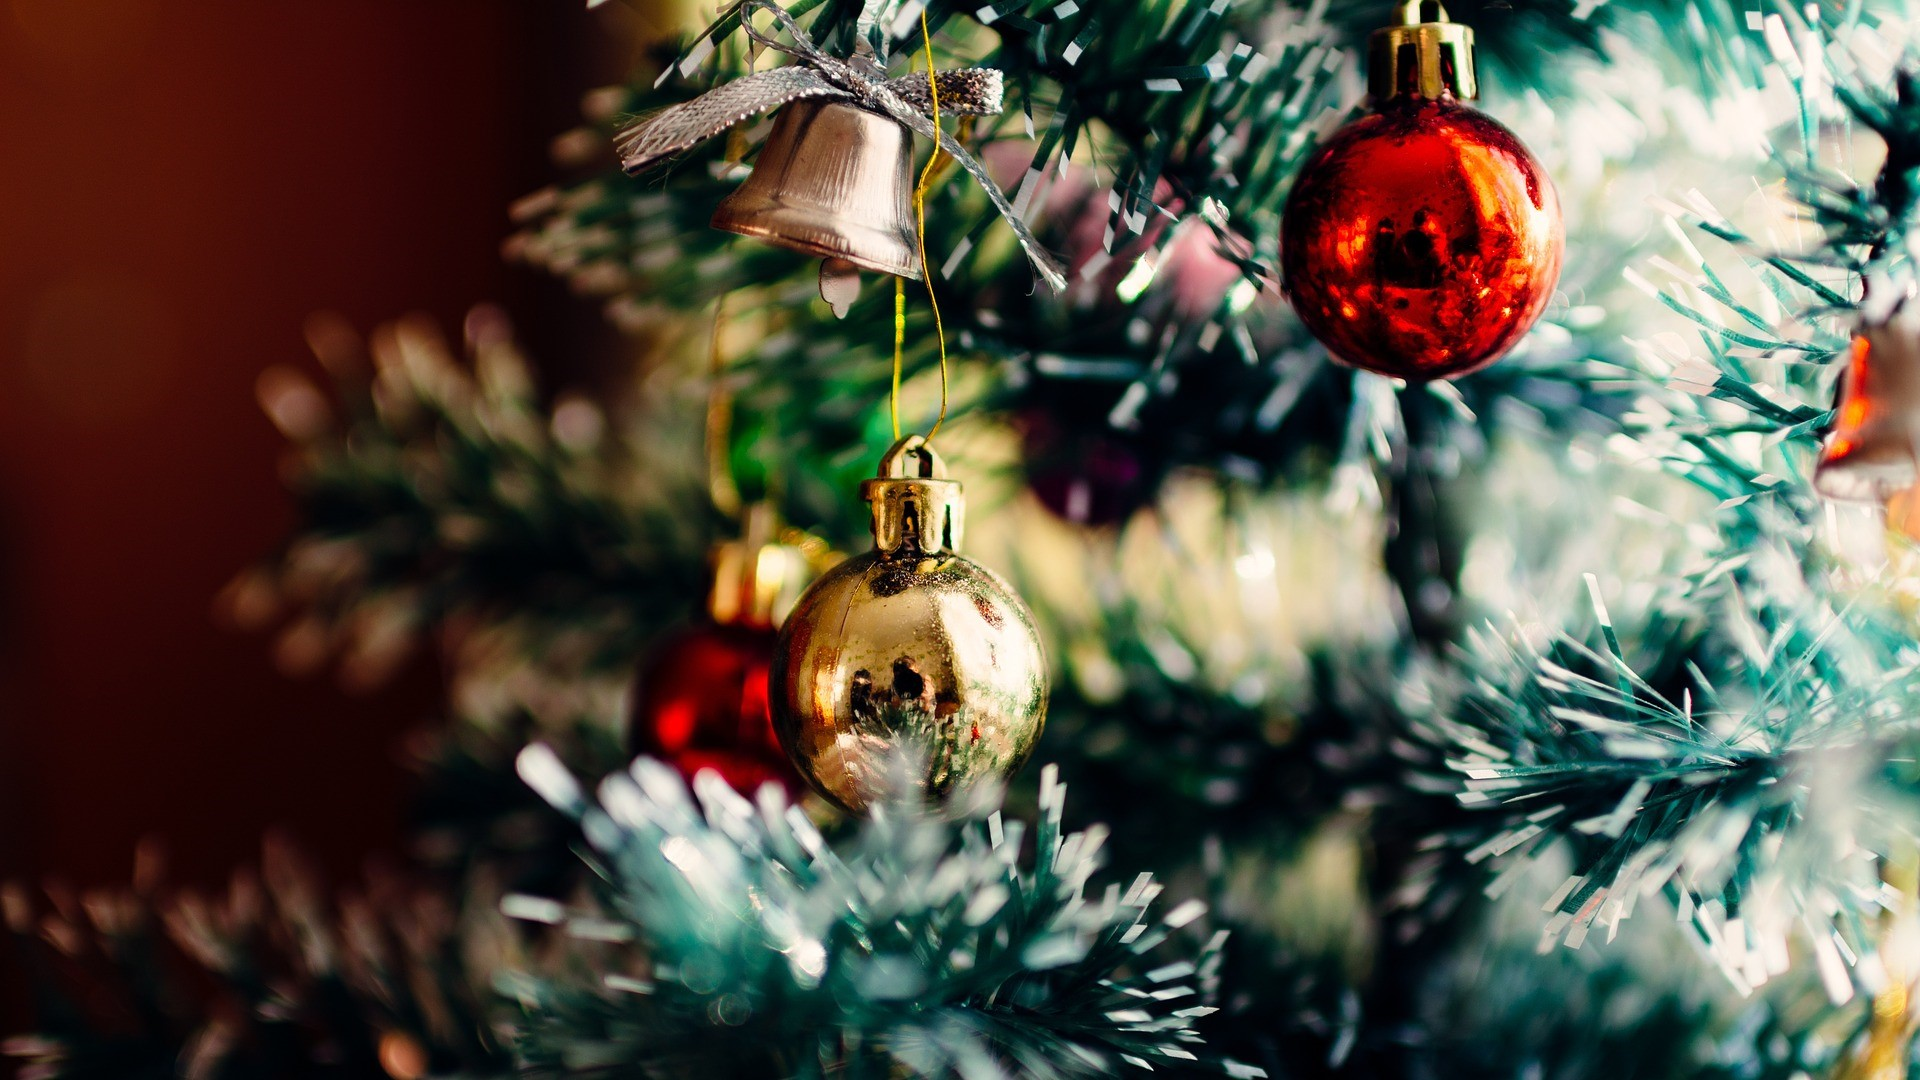 Celebrating Christmas in Jordan